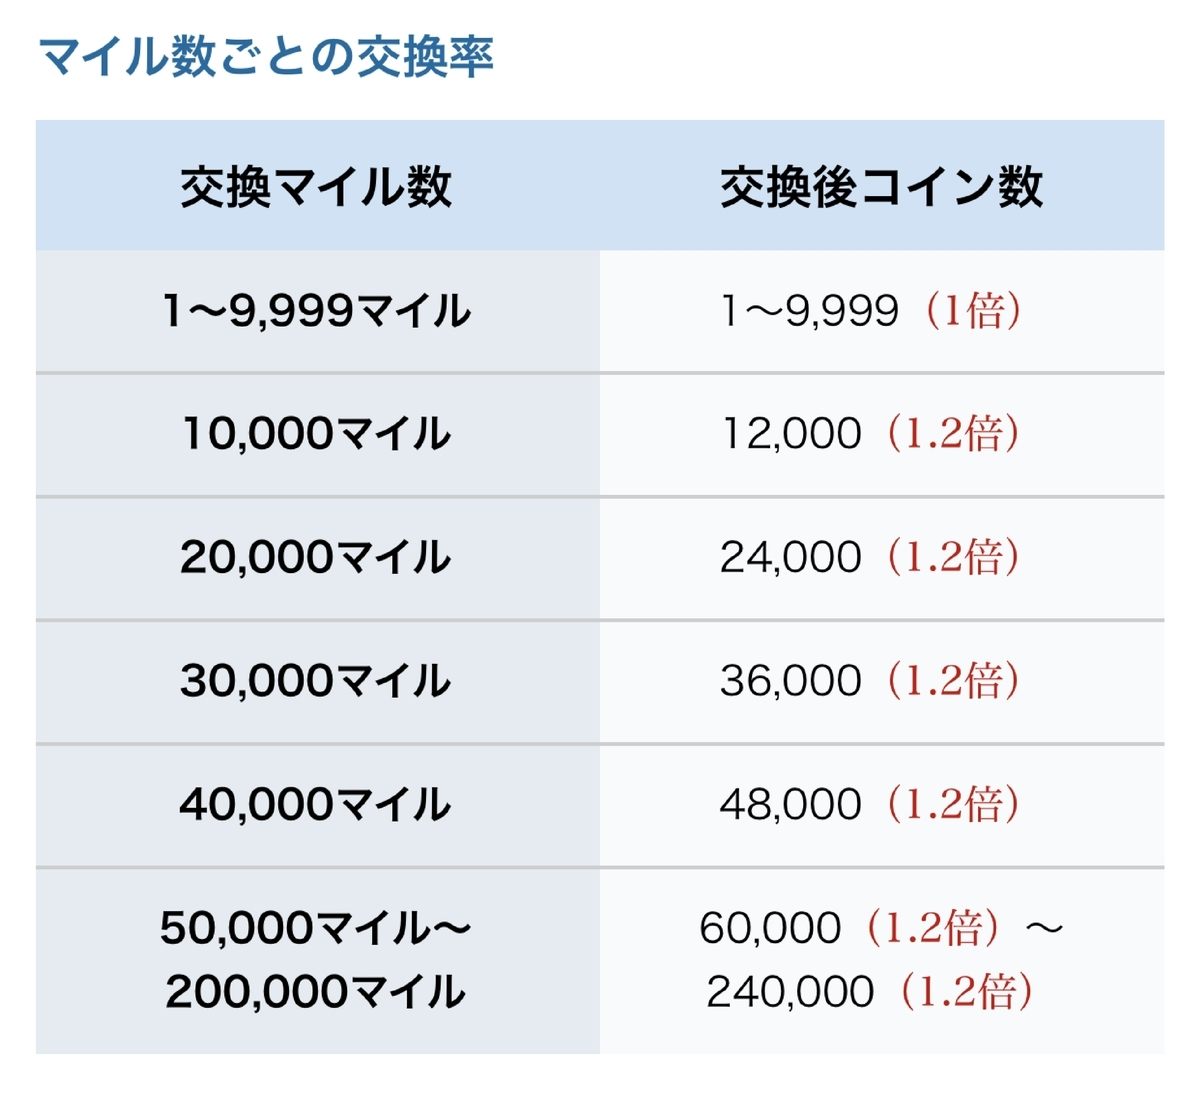 f:id:Nagoya1976:20191205135750j:plain